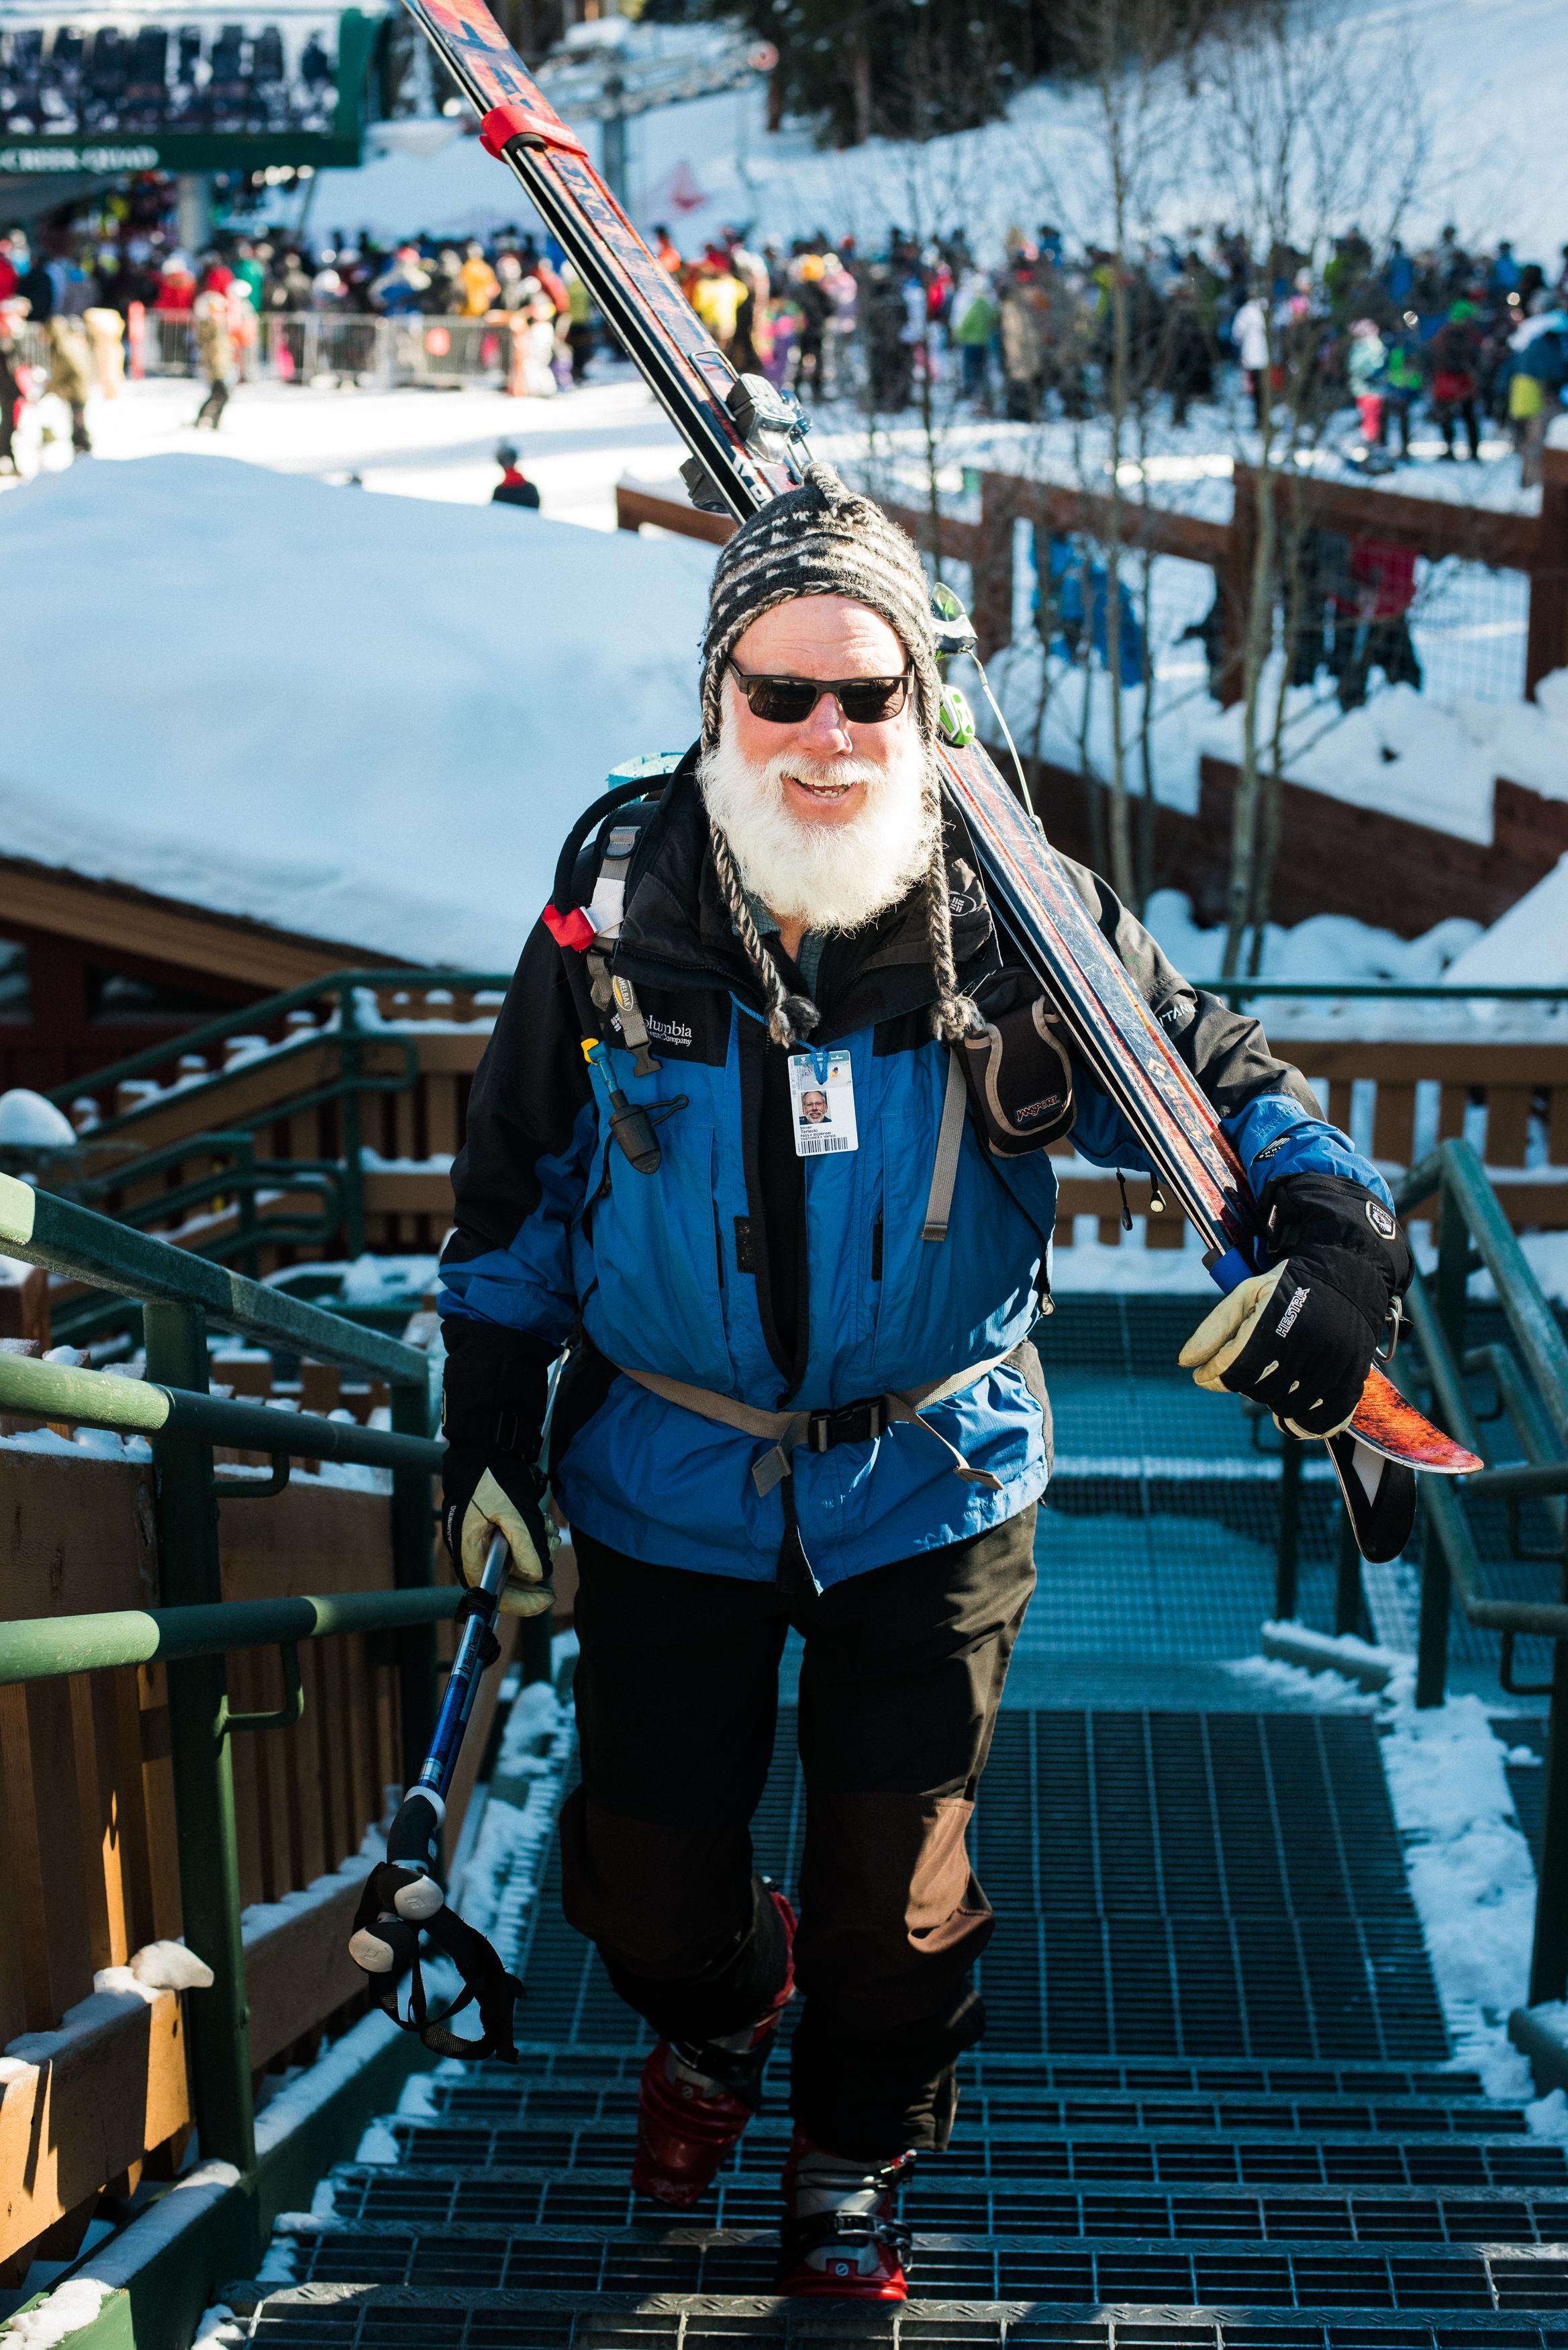 TaraShupe_Outdoor_Photographer_Loweprobags_Colorado_Copper_Mountains_Ski_31.jpg